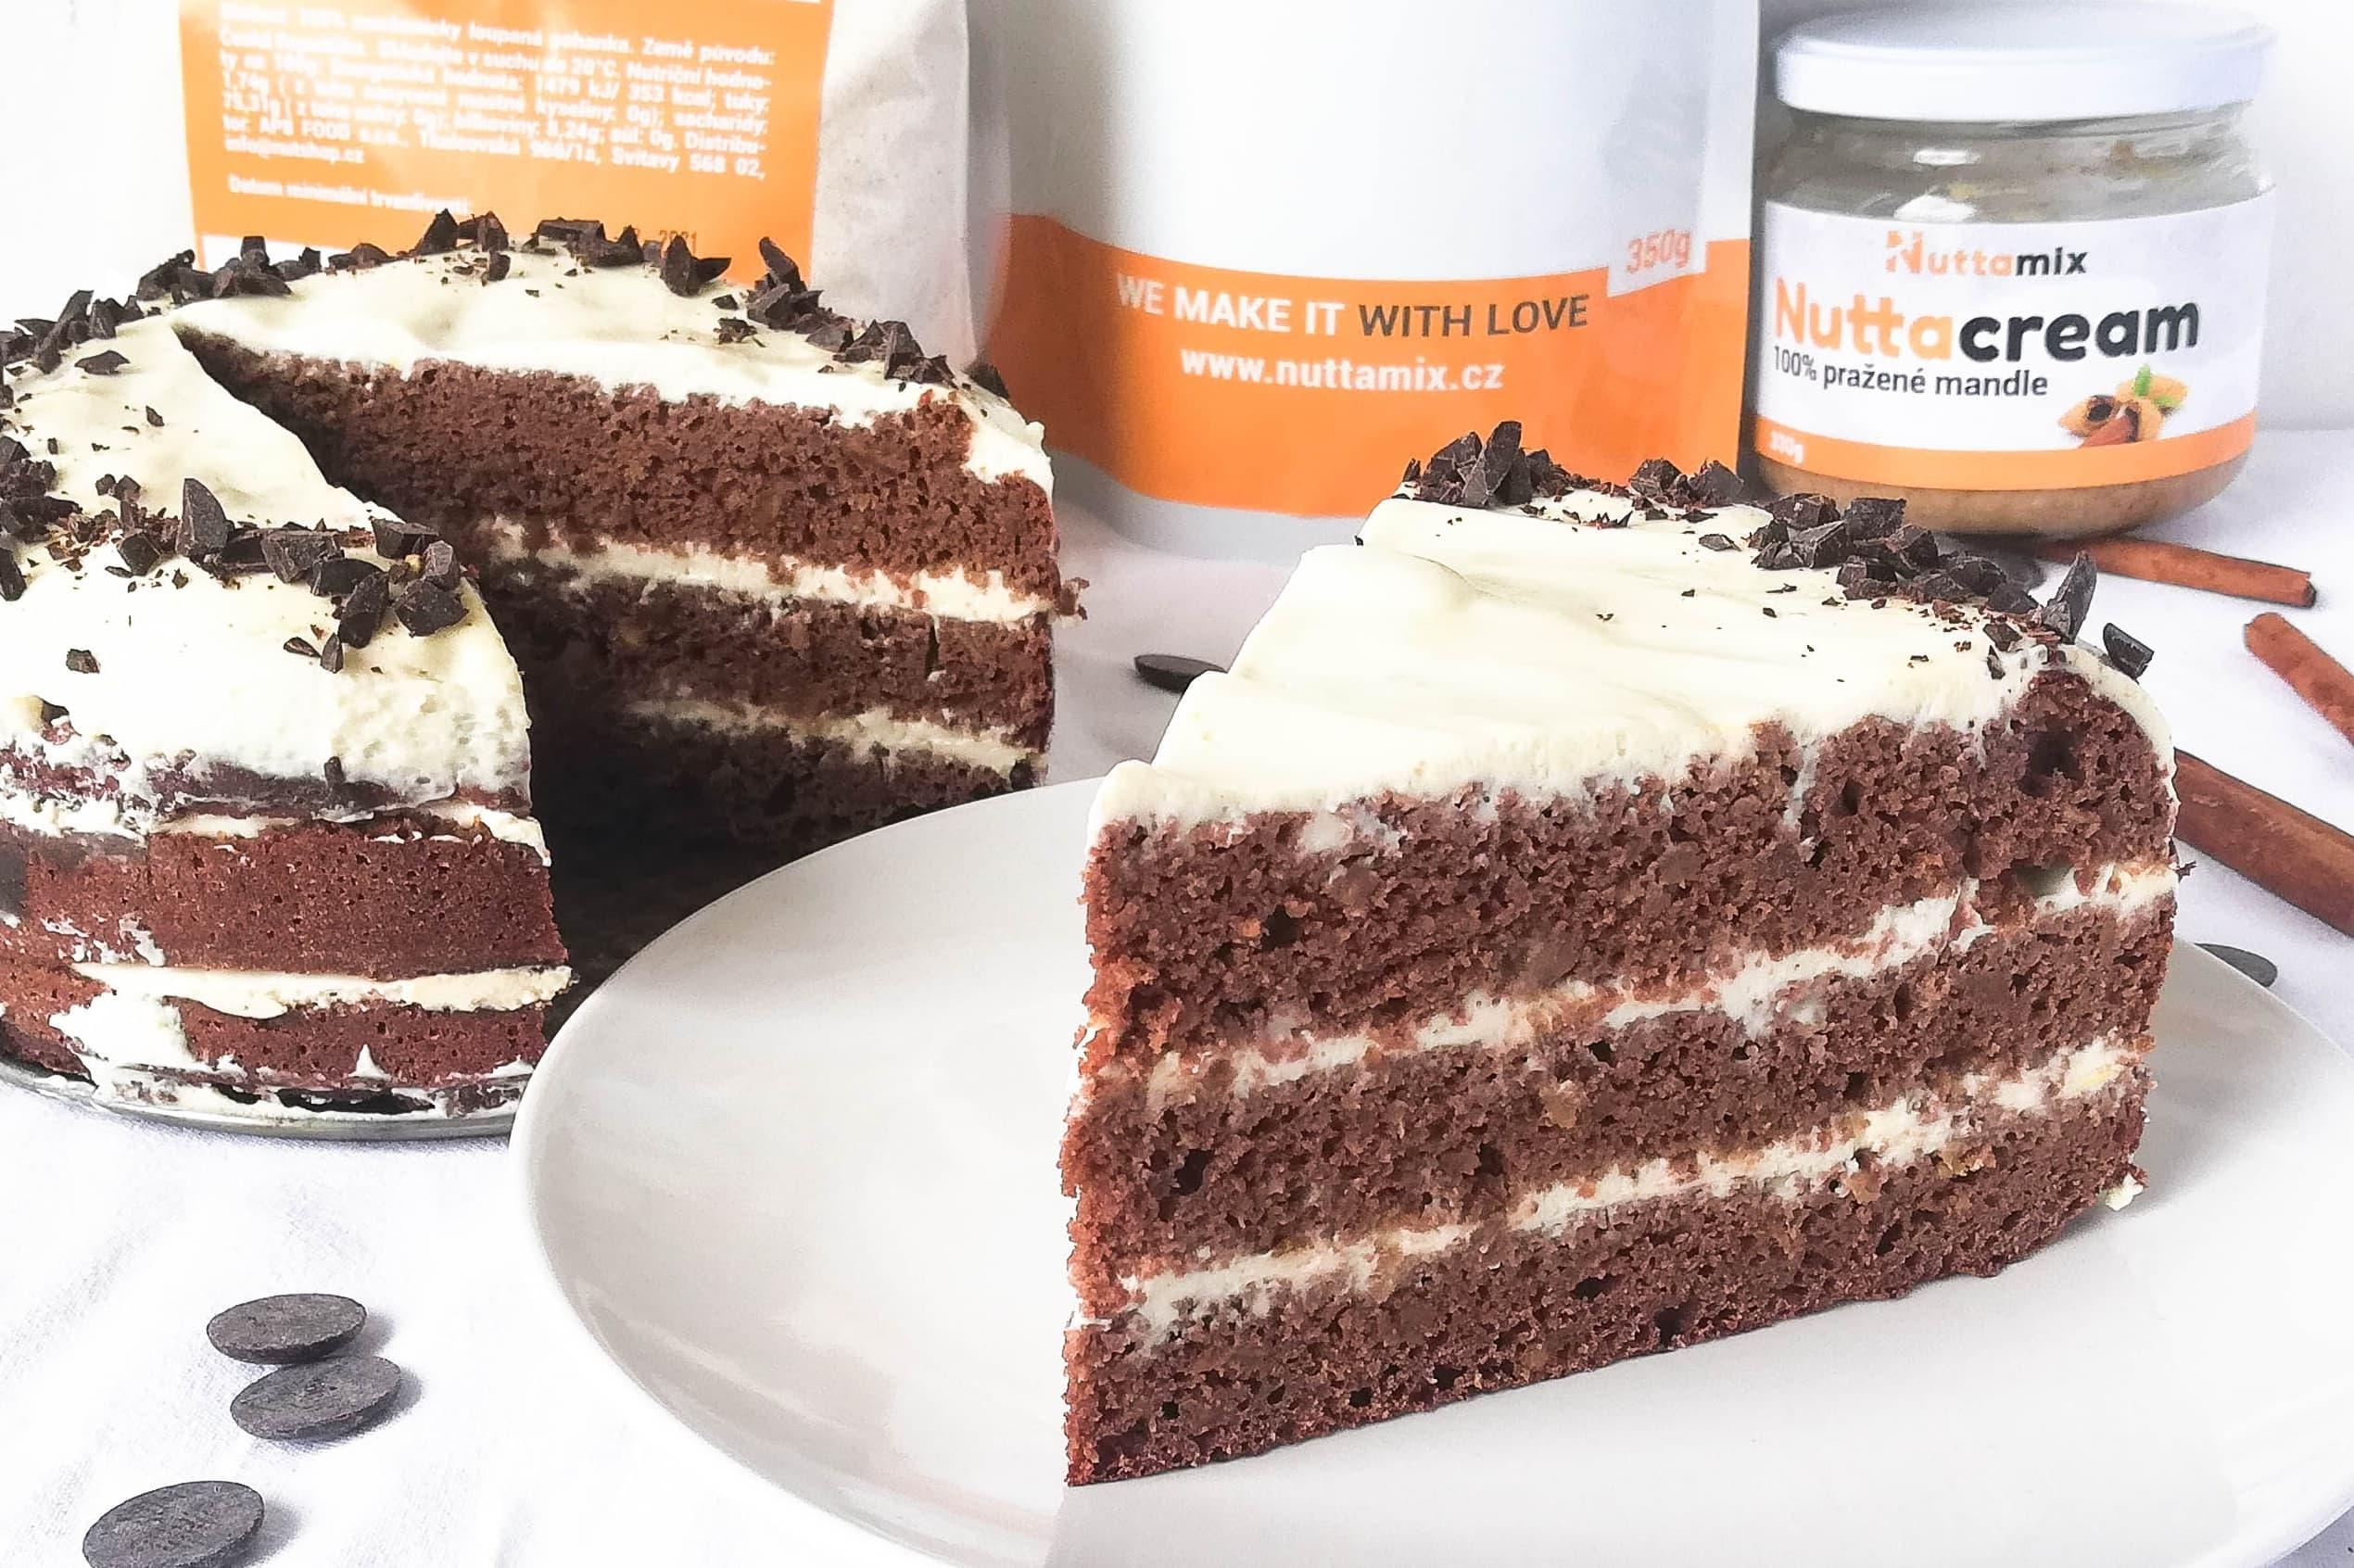 cokoladovy-dort-s-fiky-recept-nuttamix